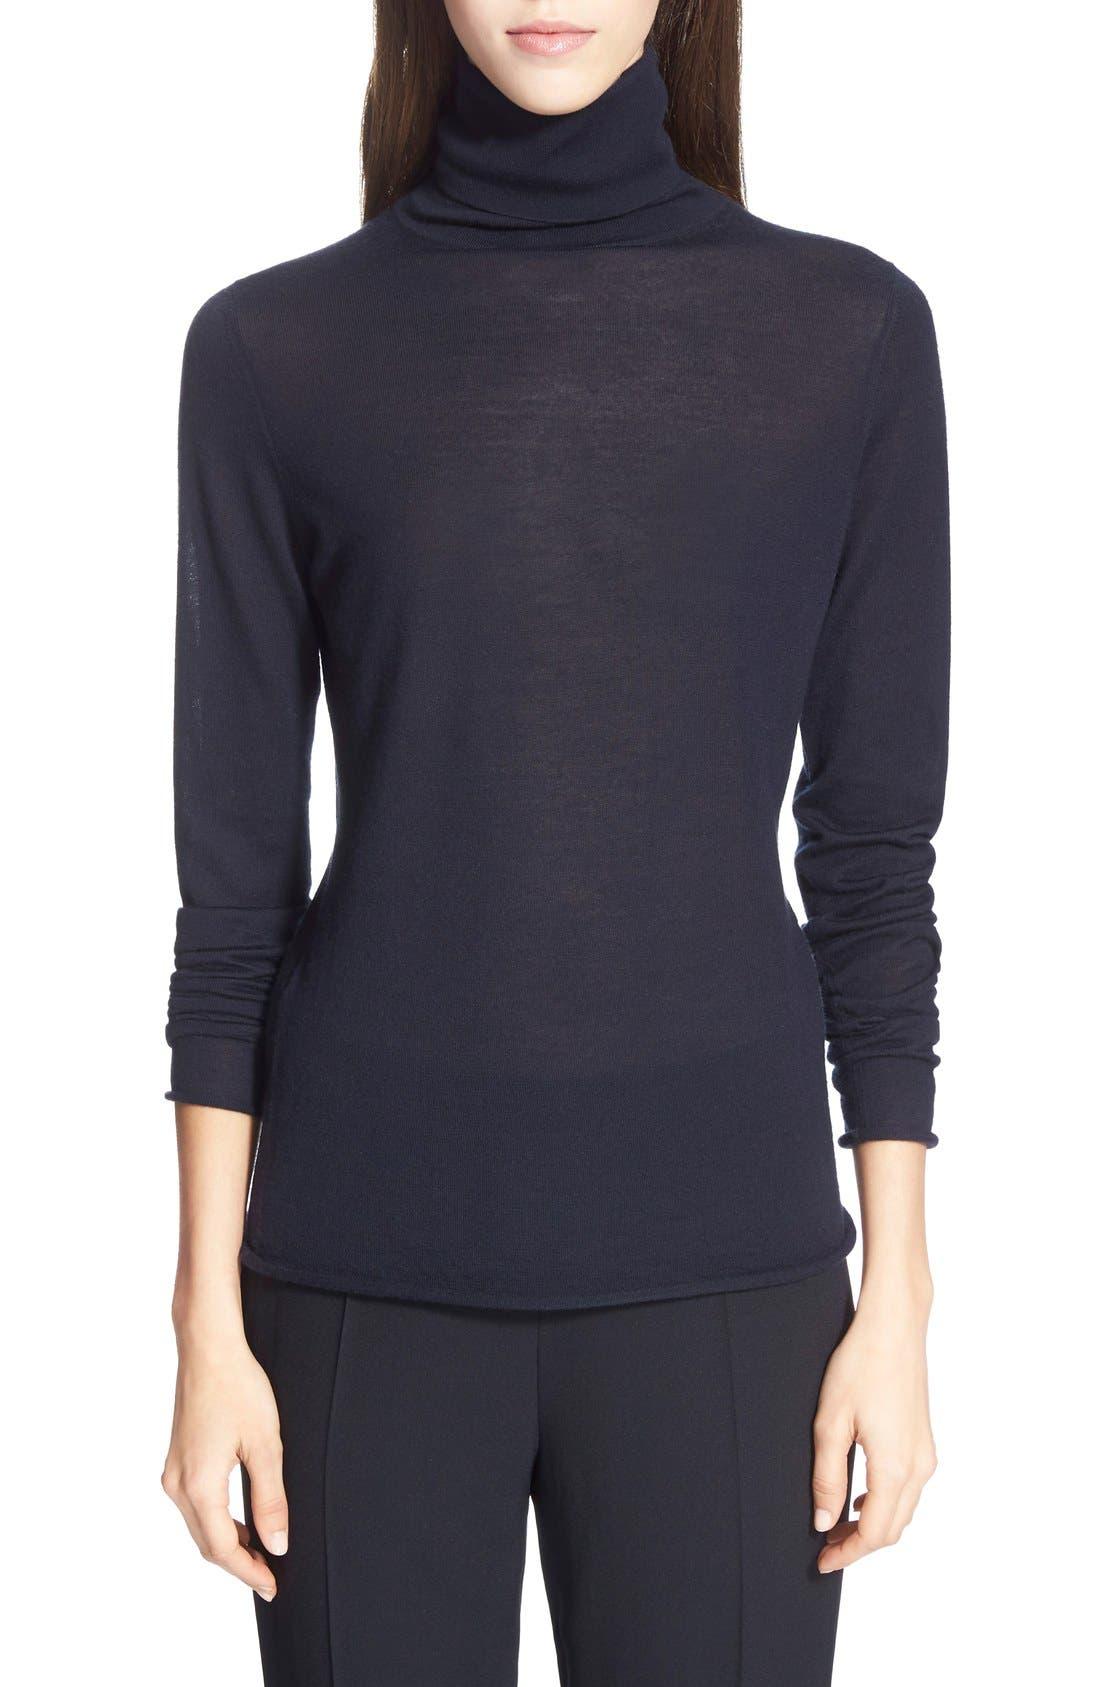 CHLOÉ Knit Turtleneck Cashmere Sweater